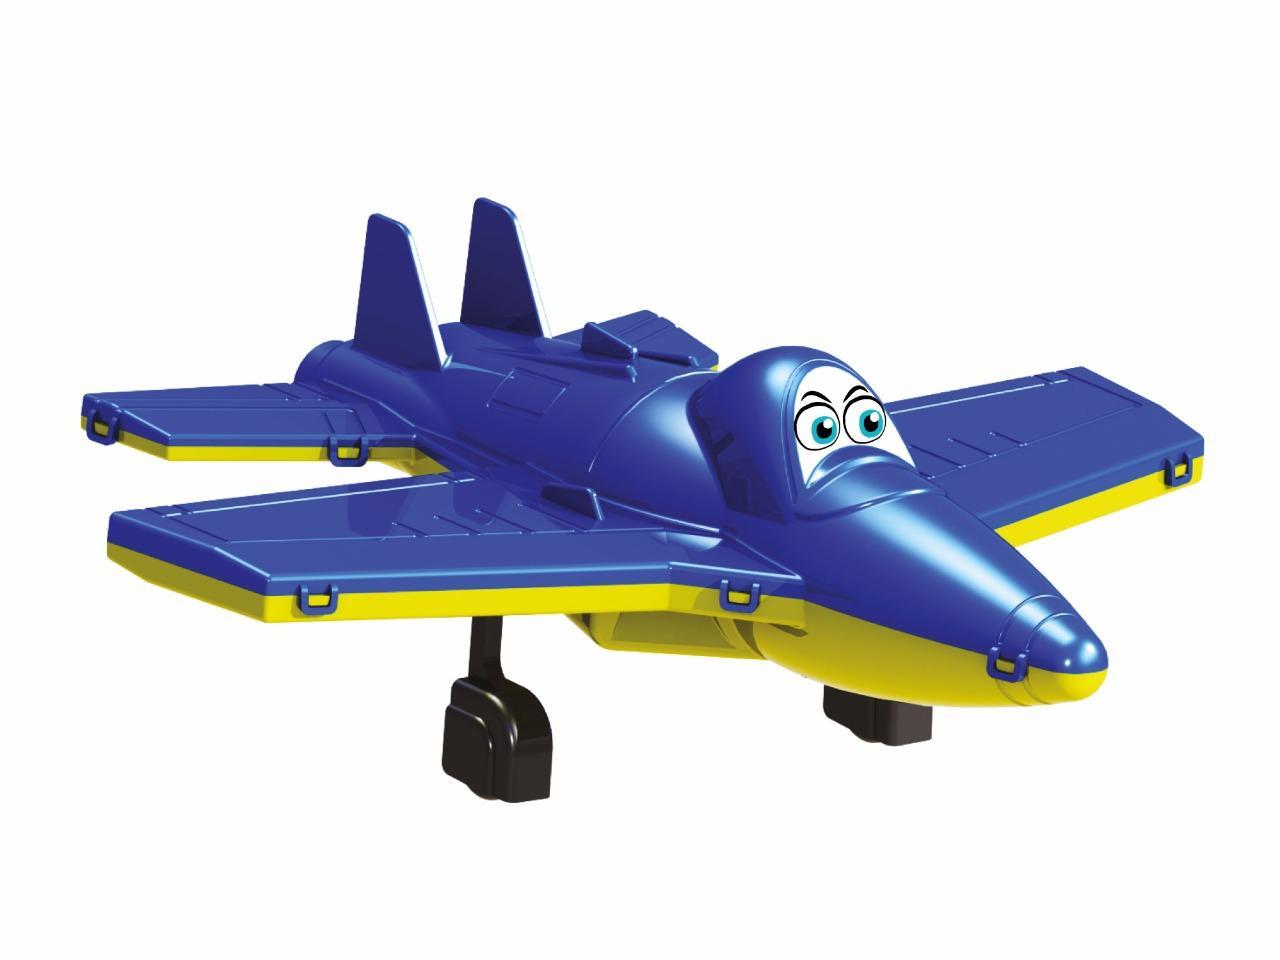 COMBATE AVIAO F15 SOLAPA